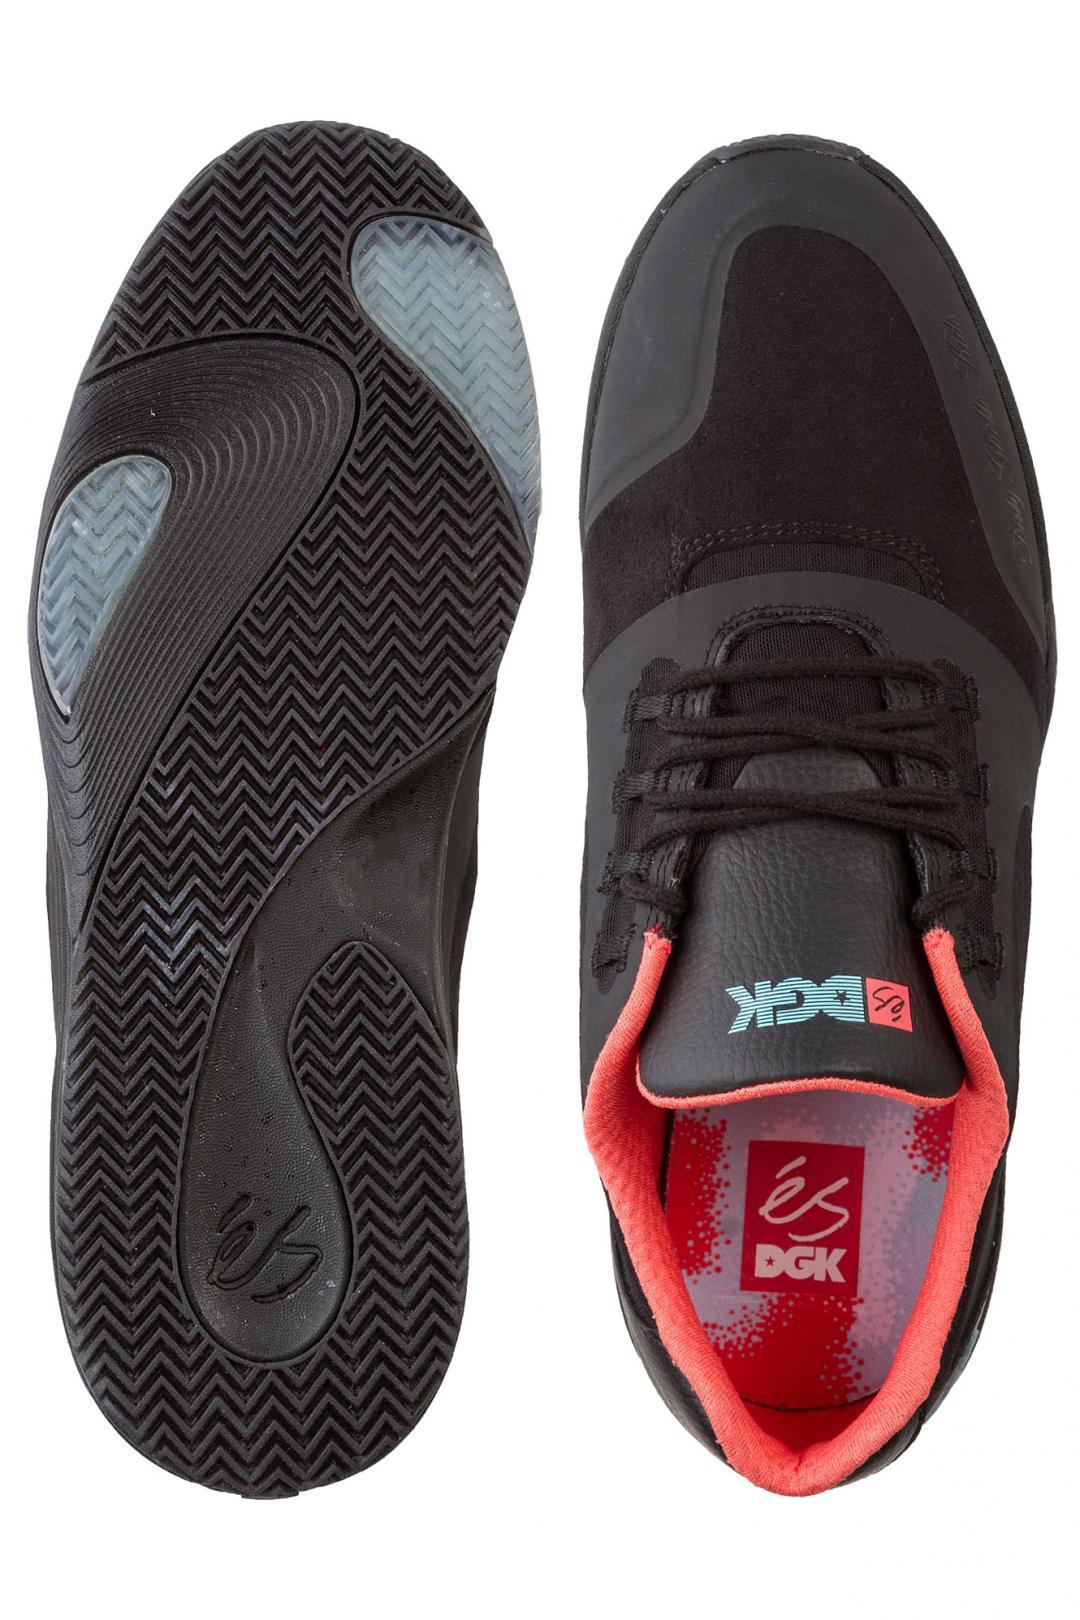 Uomo éS x DGK Skateboards Sesla black black blue   Sneaker